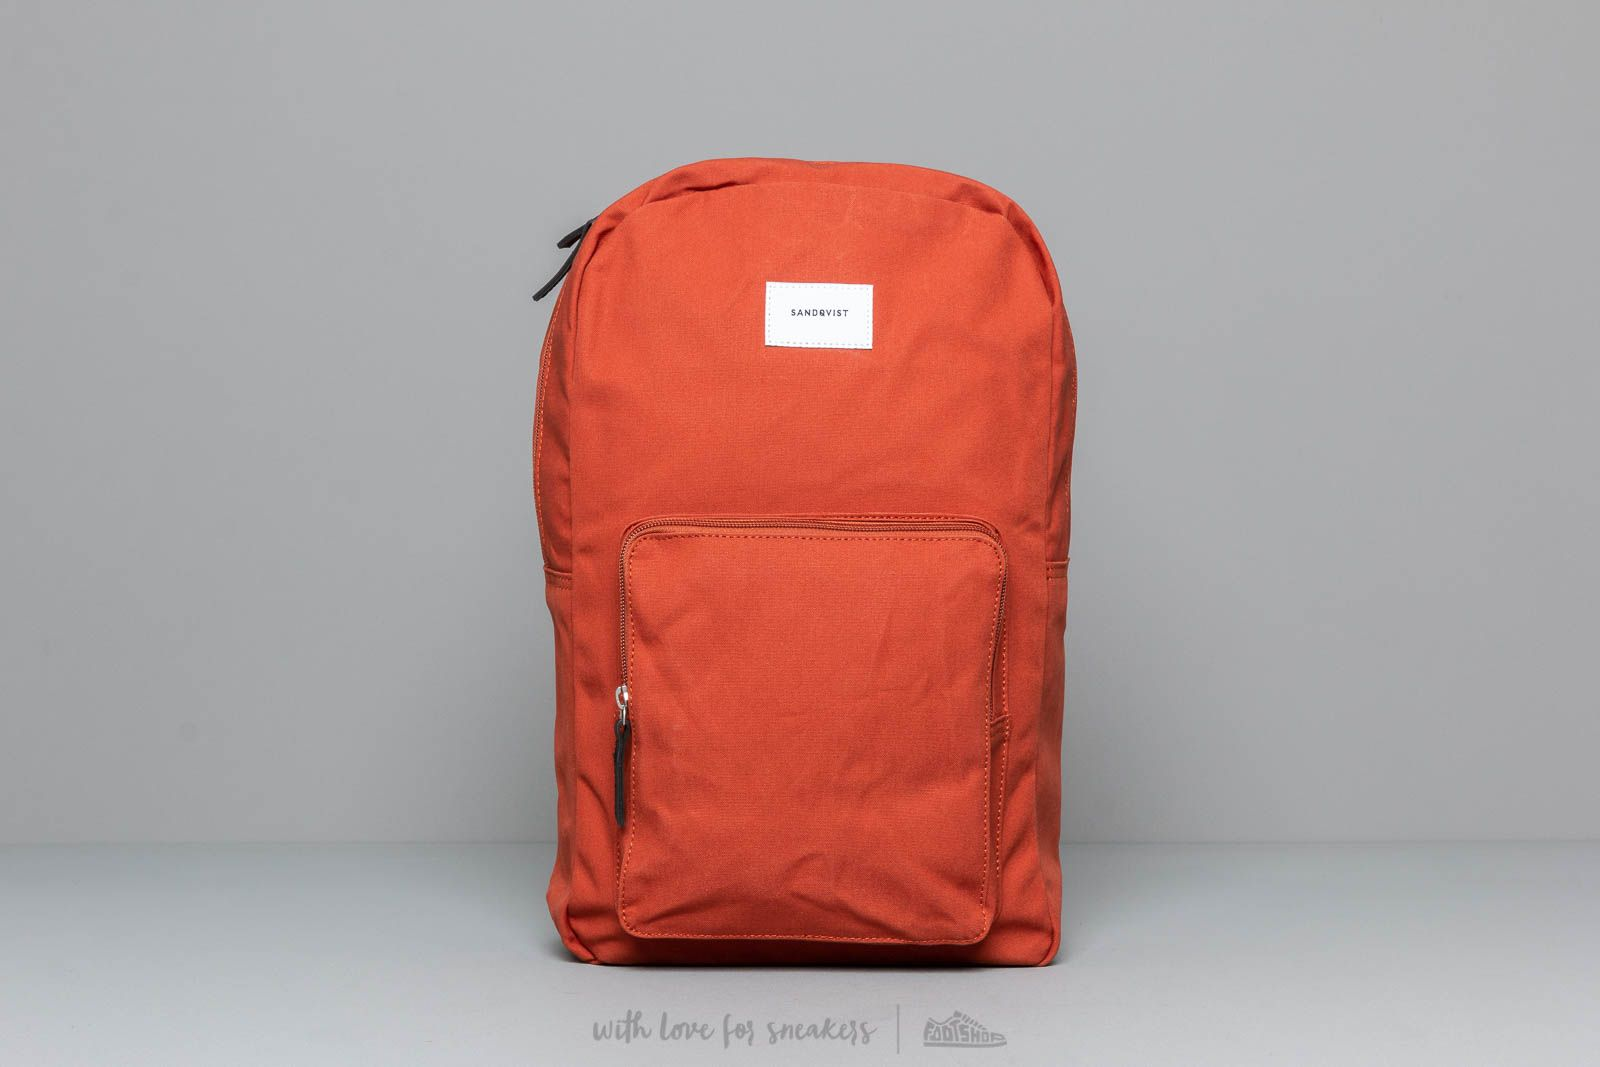 Sandqvist Ground Kim Laptop Backpack